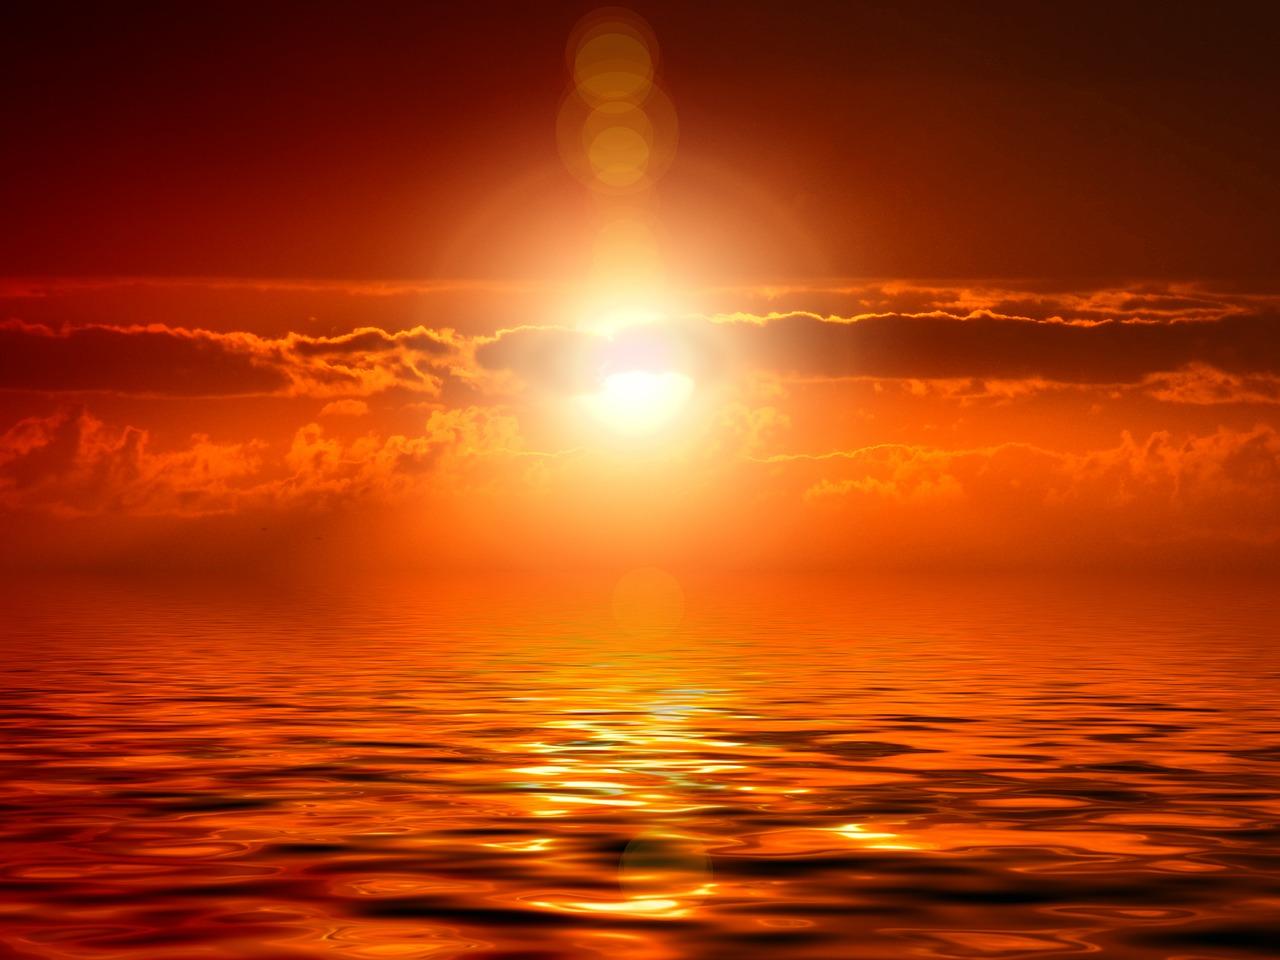 sunset-473604_1280